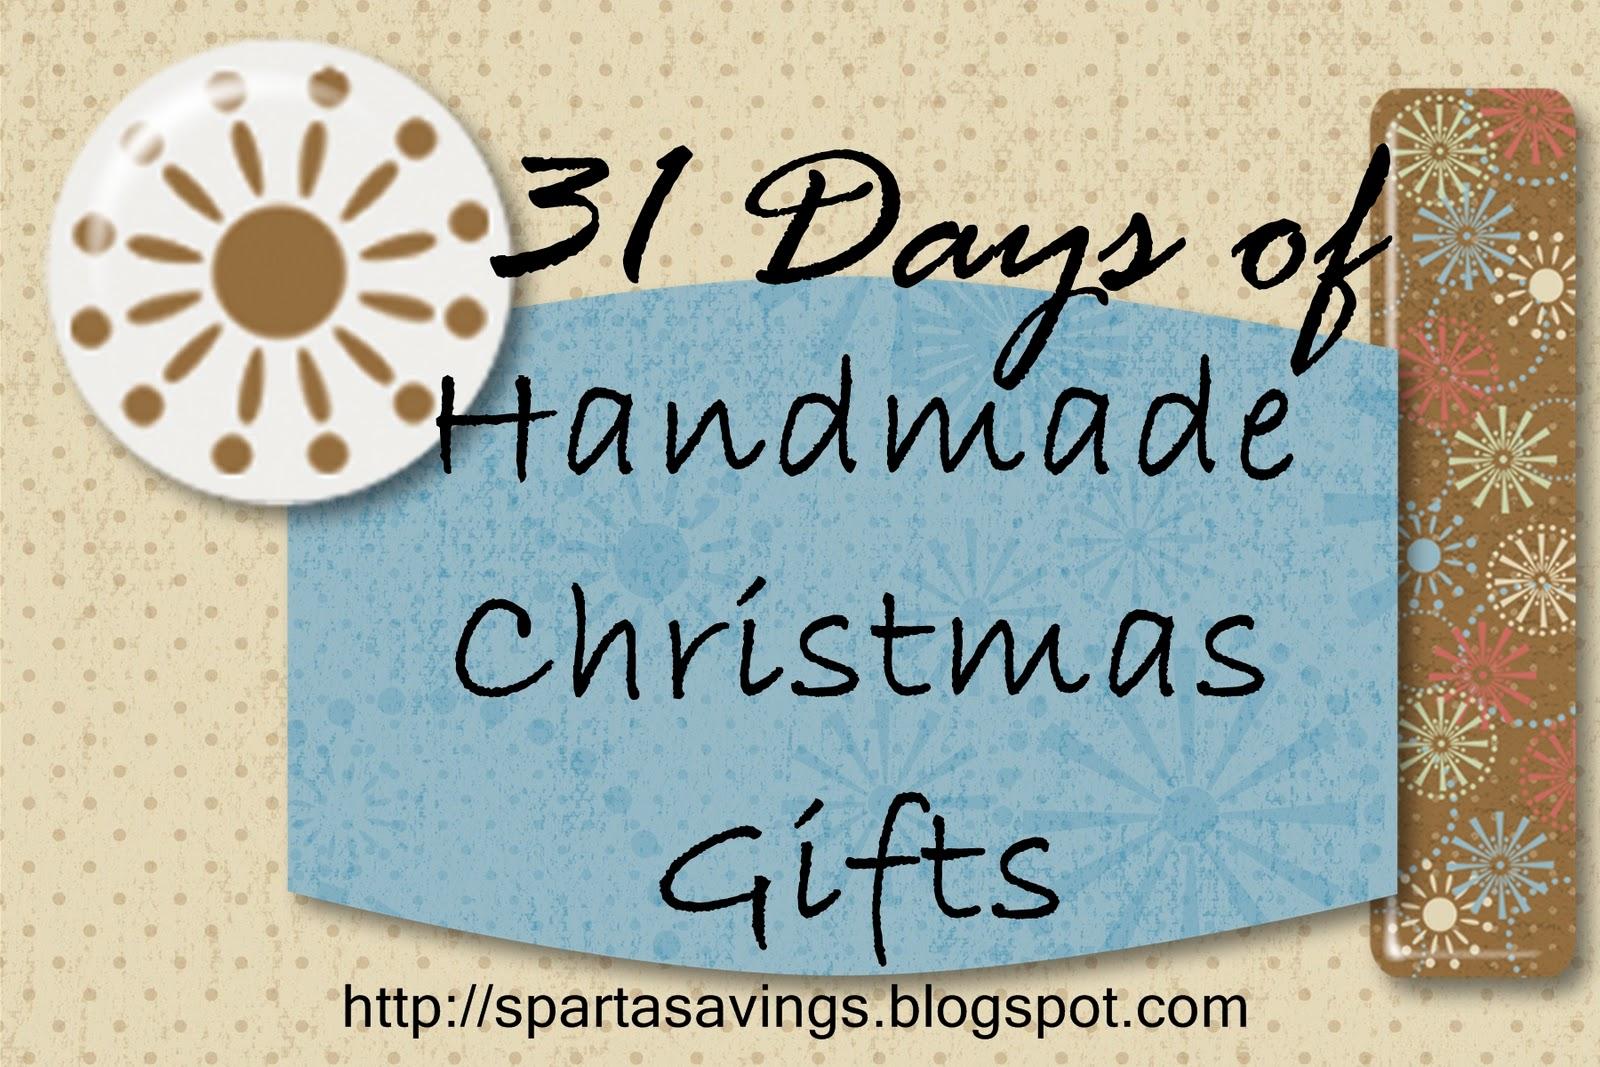 Sparta Savings: 31 Days of Handmade Christmas Gifts: Day 10 ...